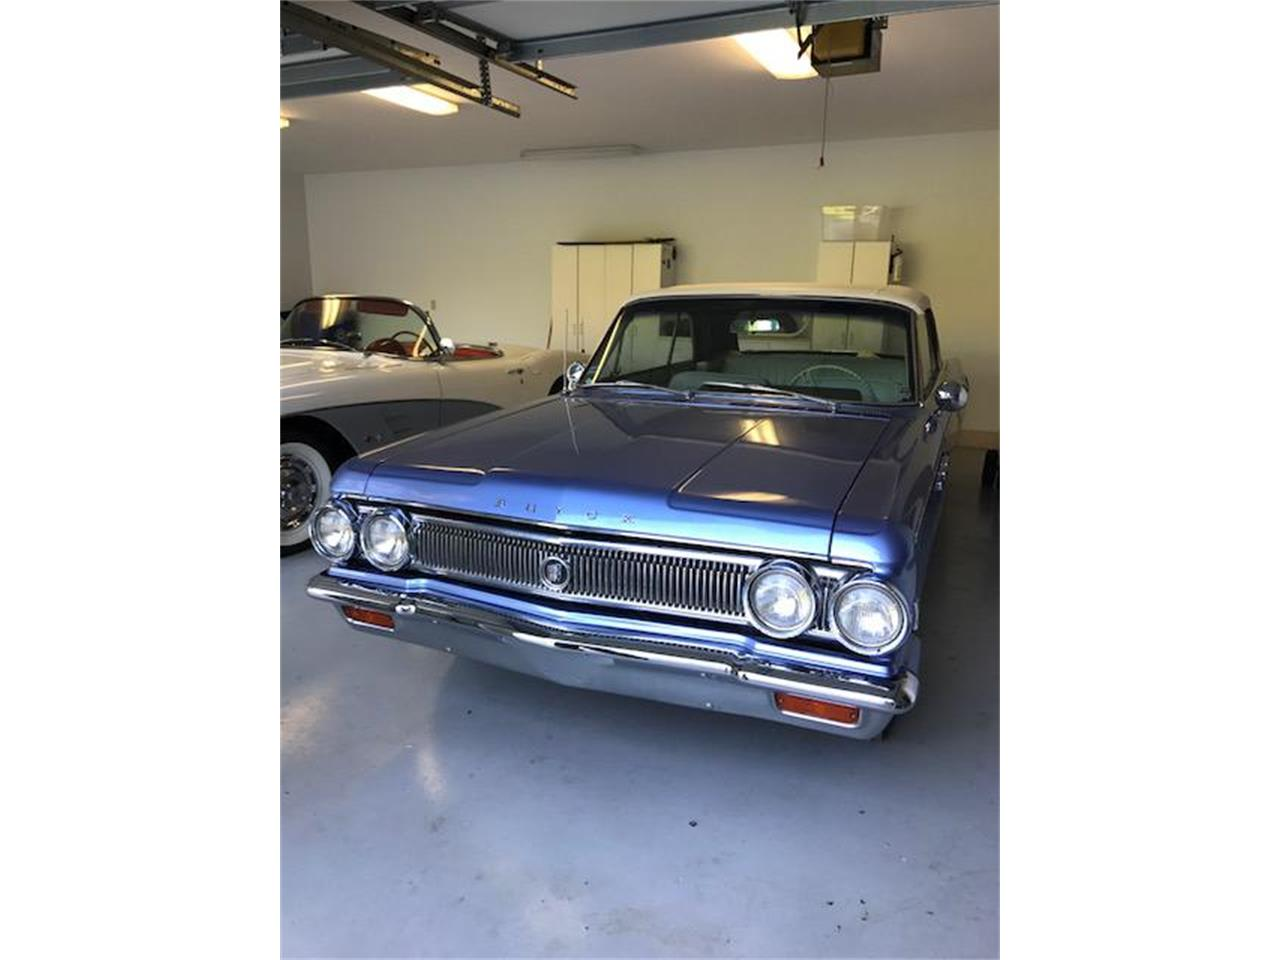 1963 Buick Skylark For Sale Classiccars Com Cc 1005061